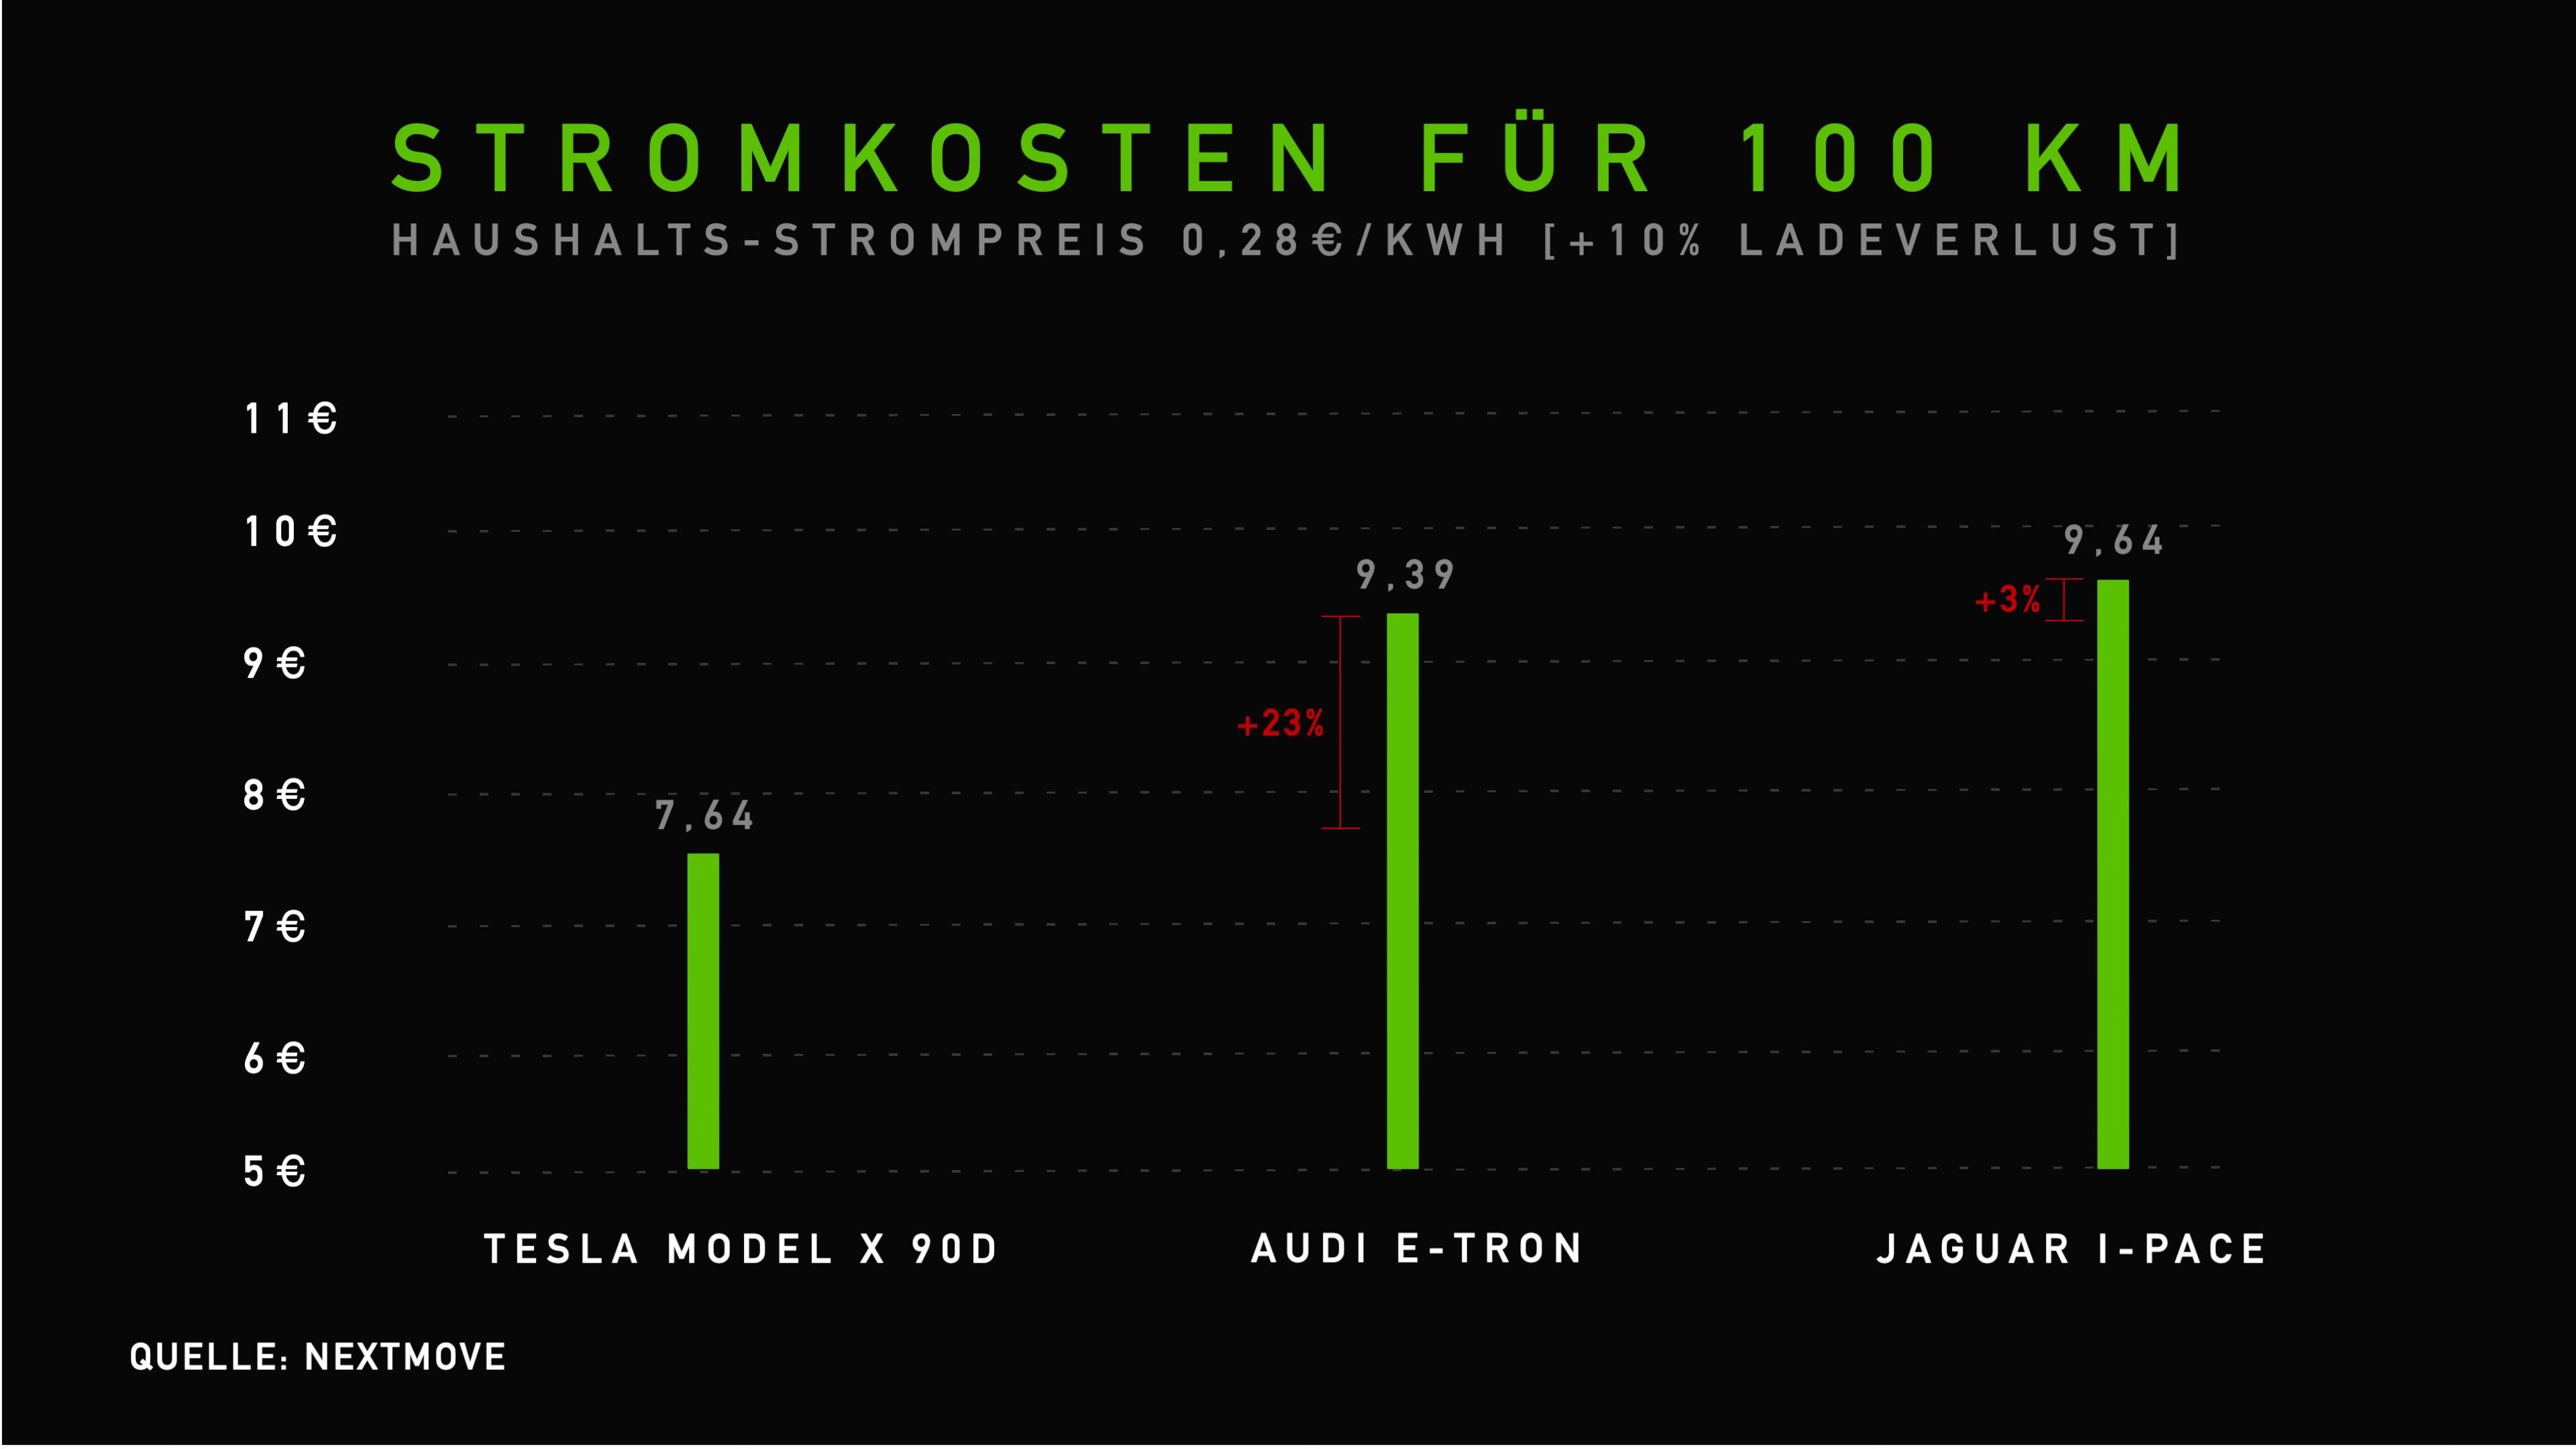 Langfristige Stromkosten Marktstart 100 km - Model X, e-tron, Jaguar I-Pace